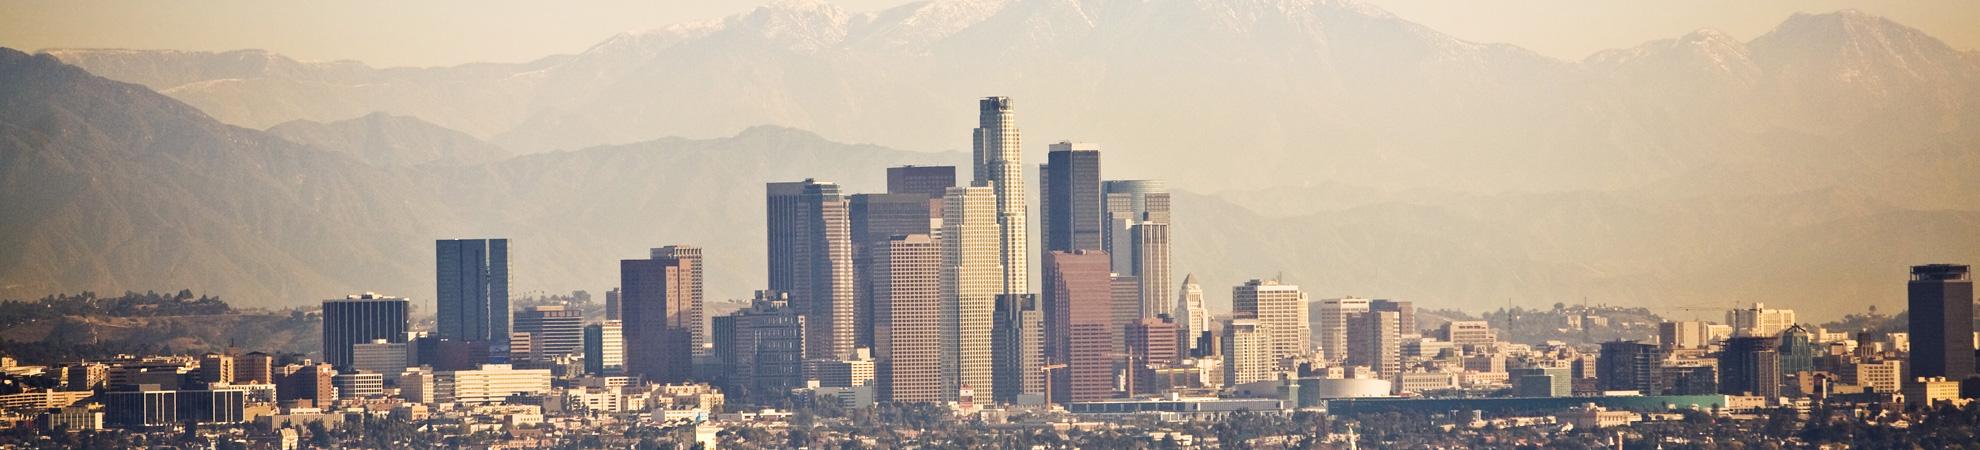 Voyage Los Angeles tout compris